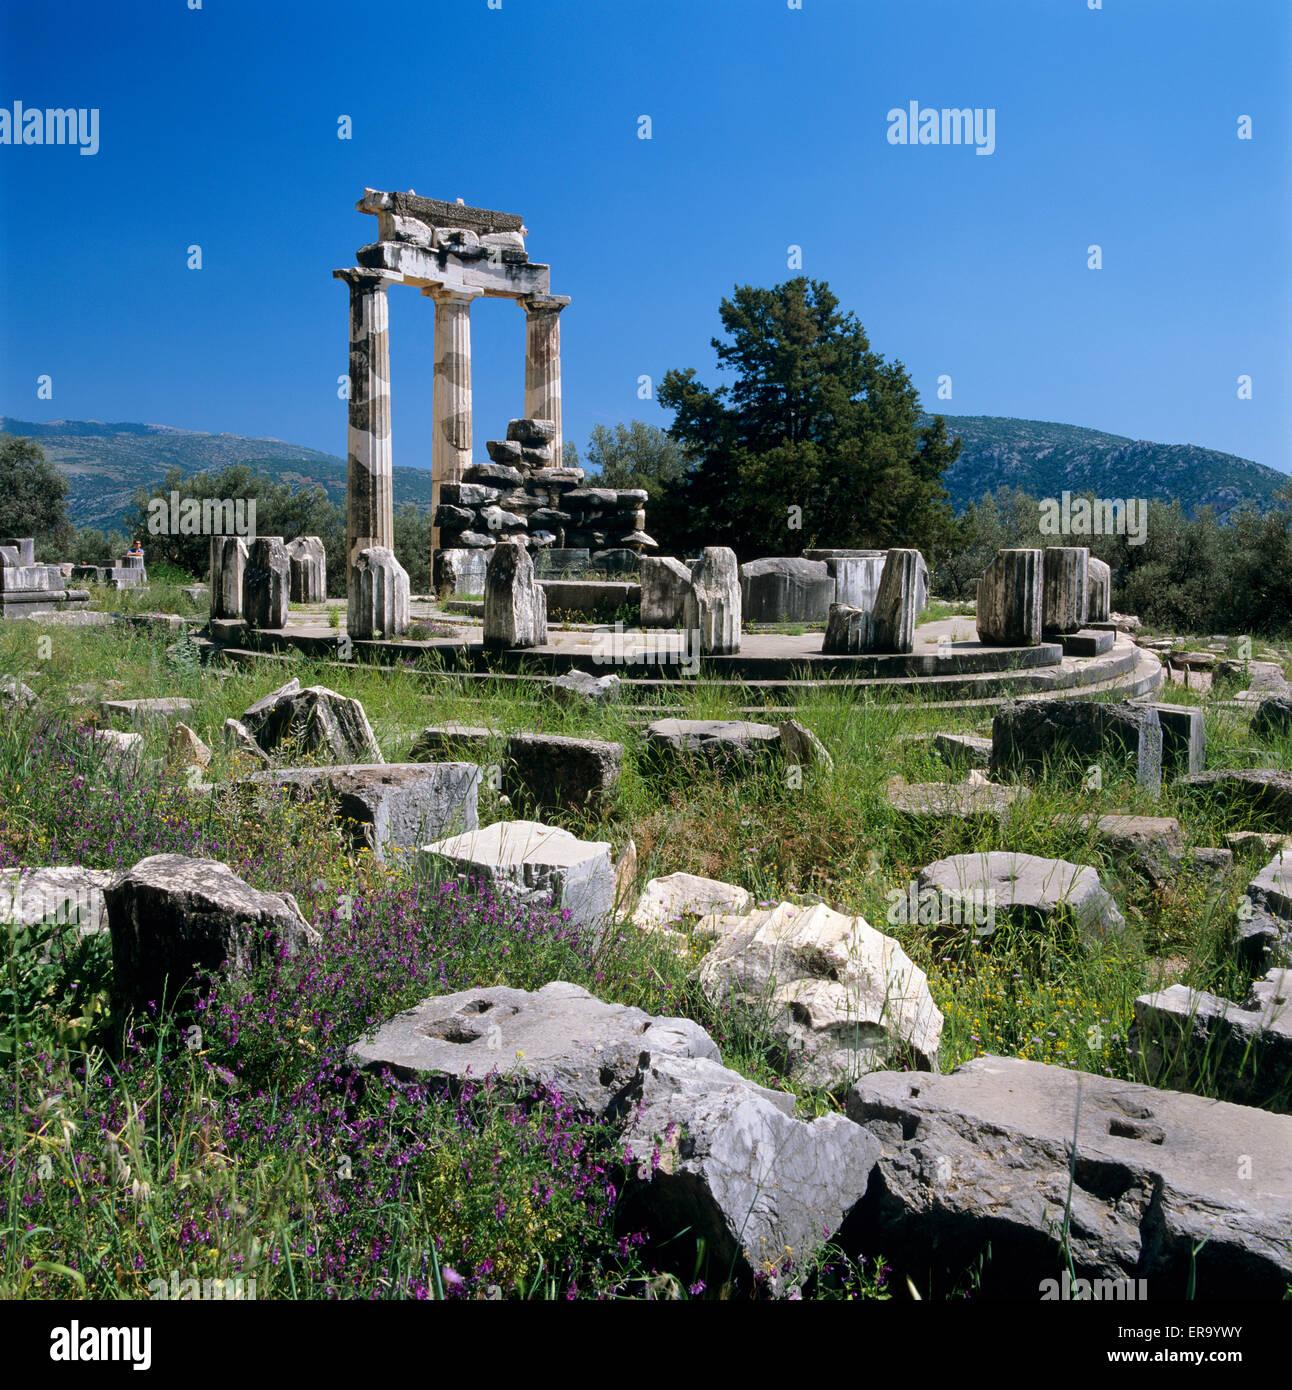 The Tholos below Mount Parnassus, Delphi, Phocis, Central Greece, Greece, Europe Stock Photo